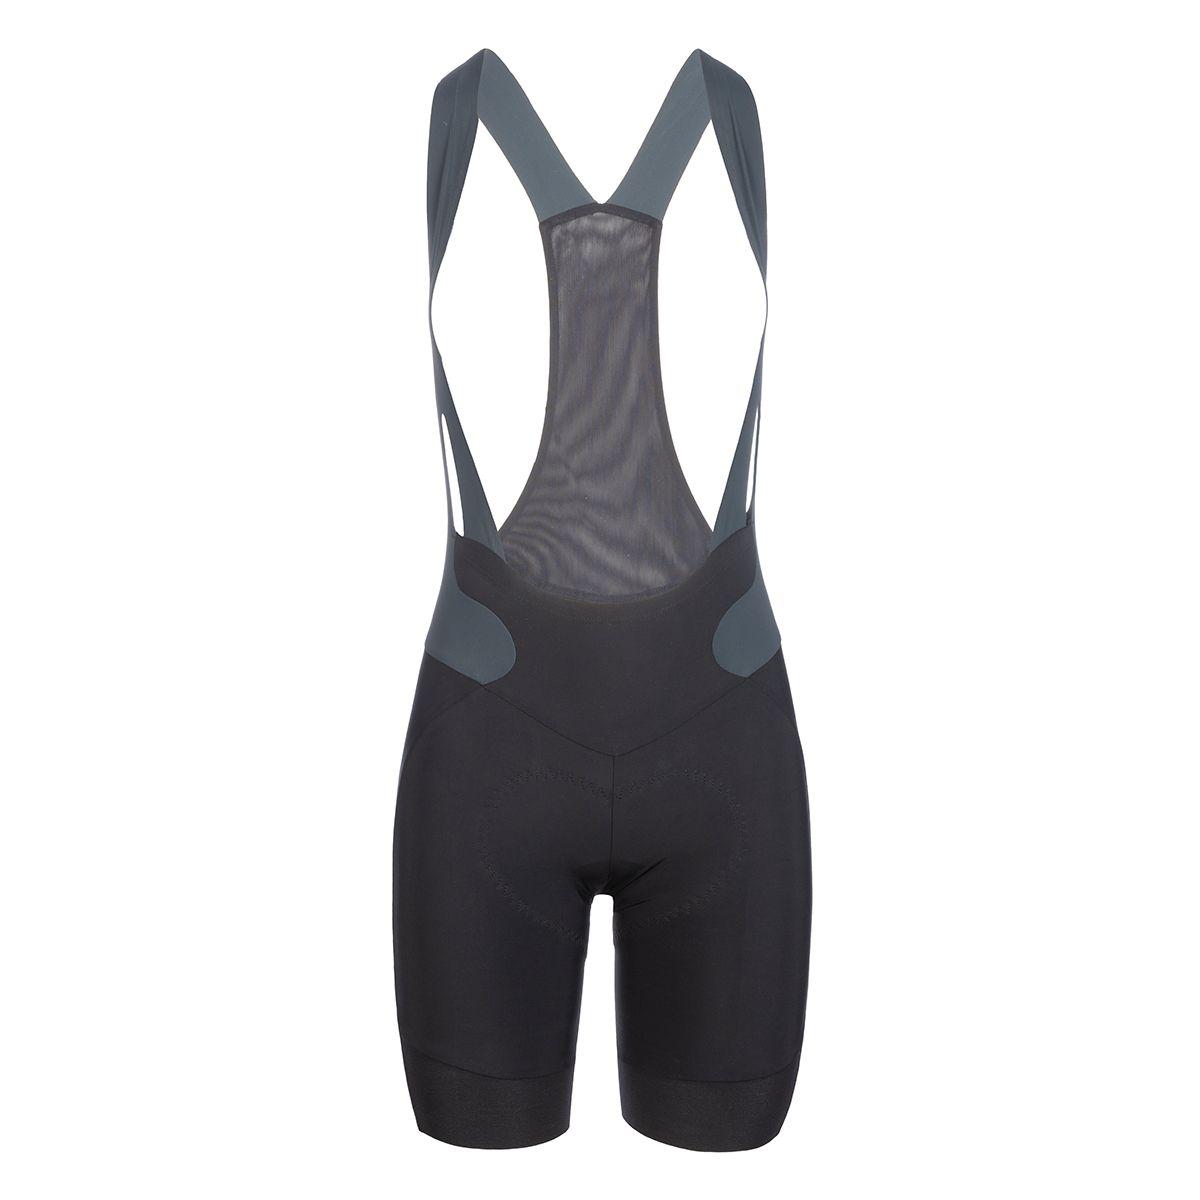 Q36.5 Women's Salopette Miles Gregarius Ultra Damen Trägerhose